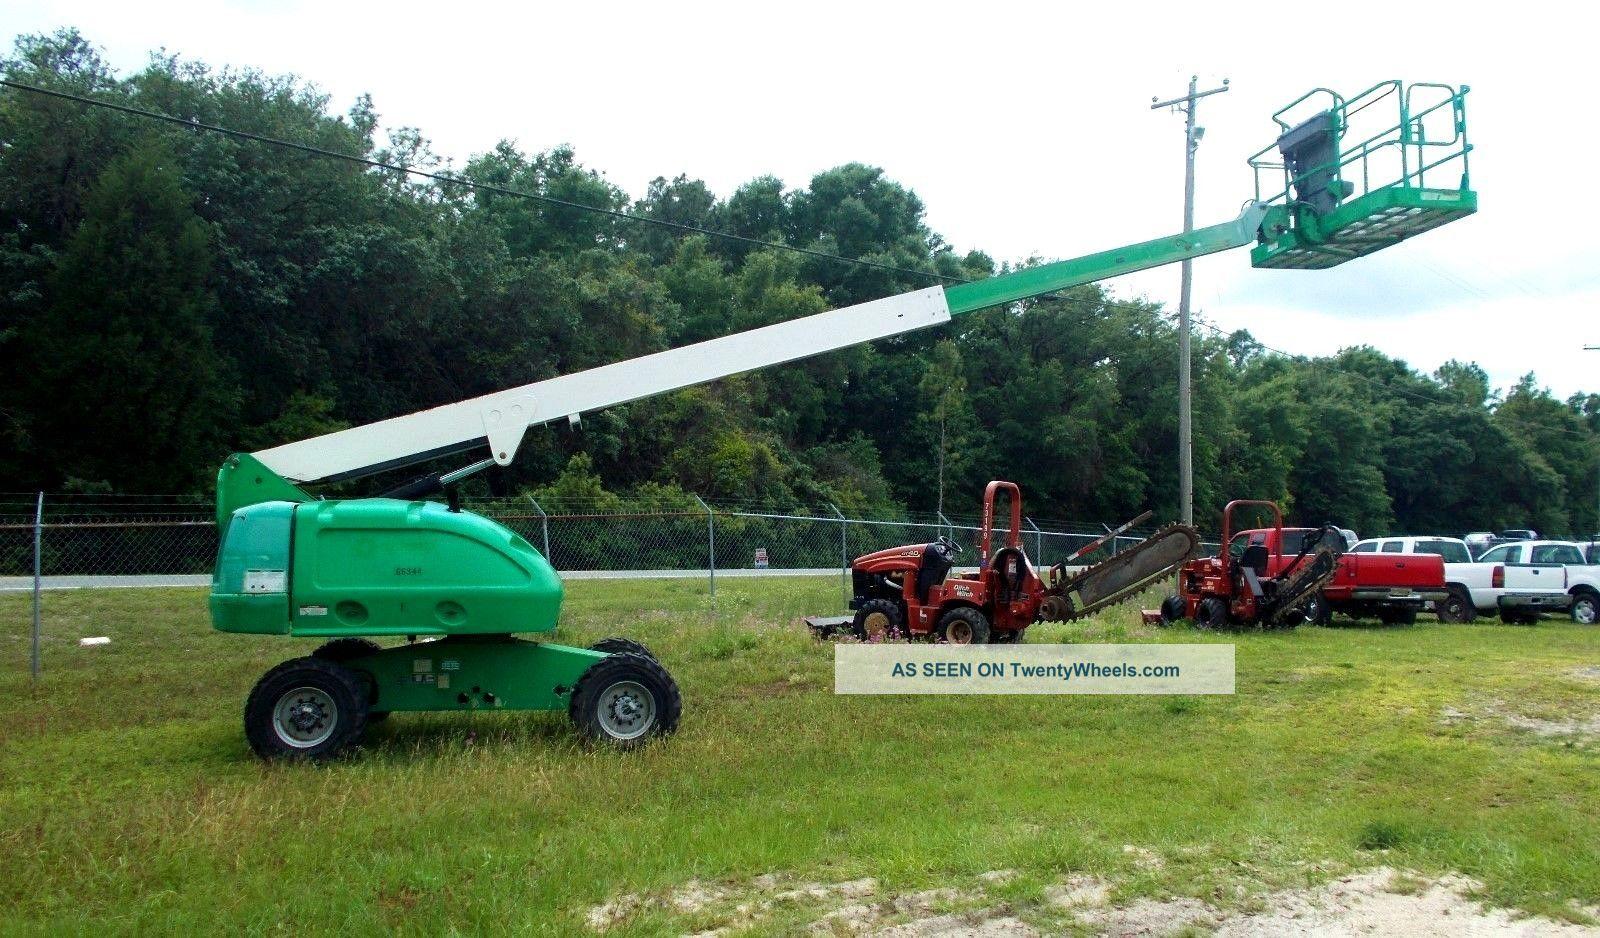 Single Man Lift 40 Ft : Jlg s man lift ft reach telescopic boom